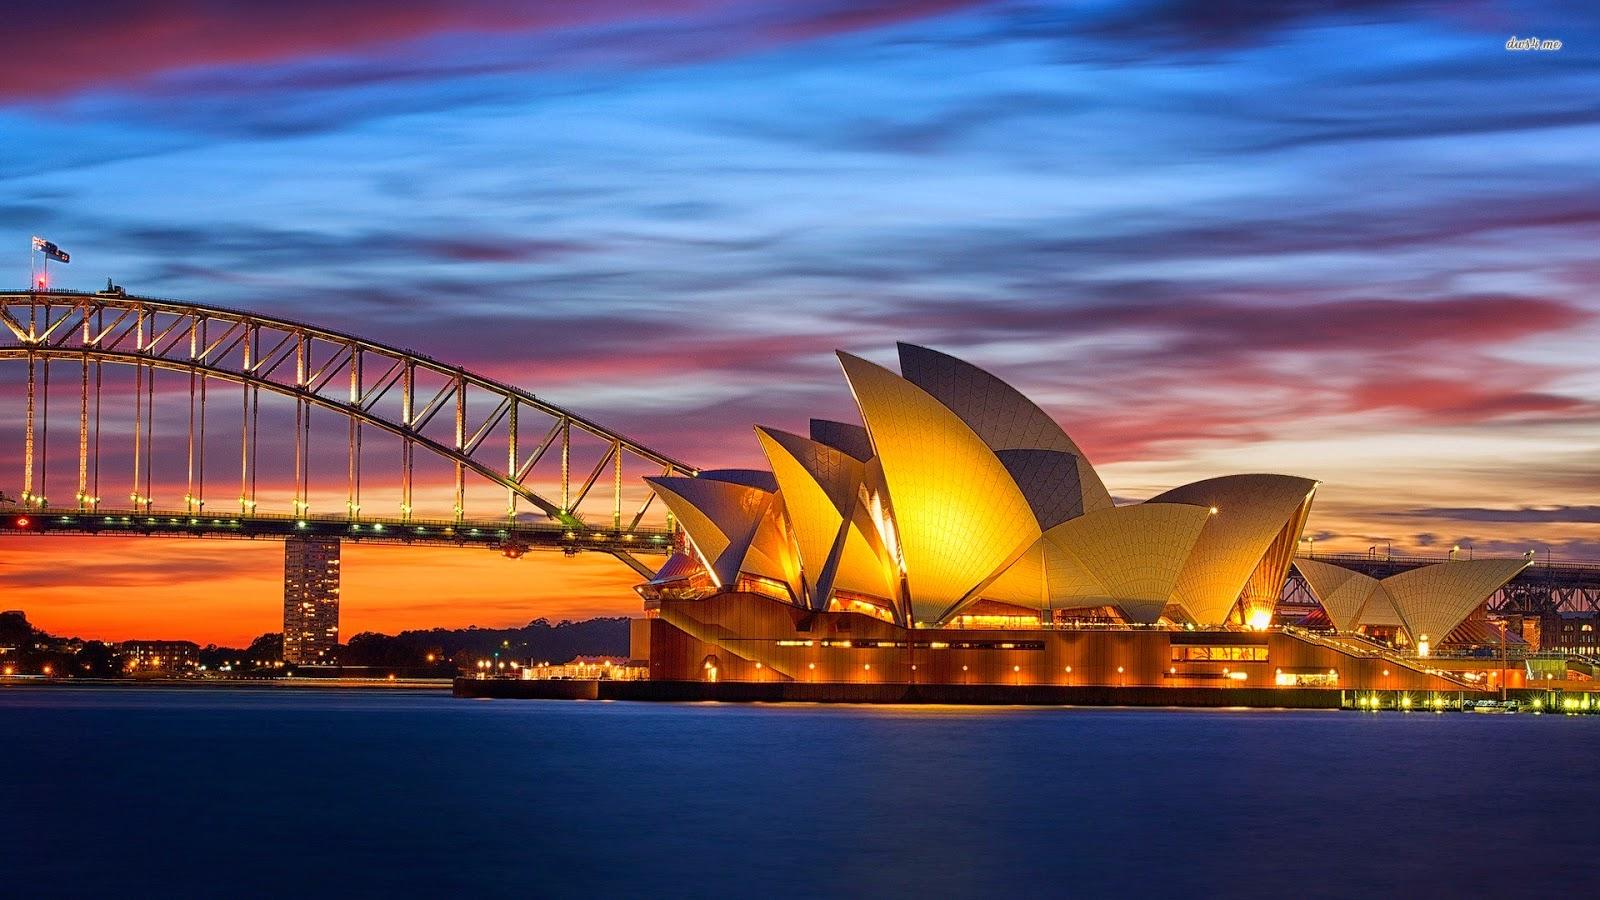 18486 sydney opera house 1920x1080 world wallpaper - View Where To Take Photo Of Sydney Opera House  Gif